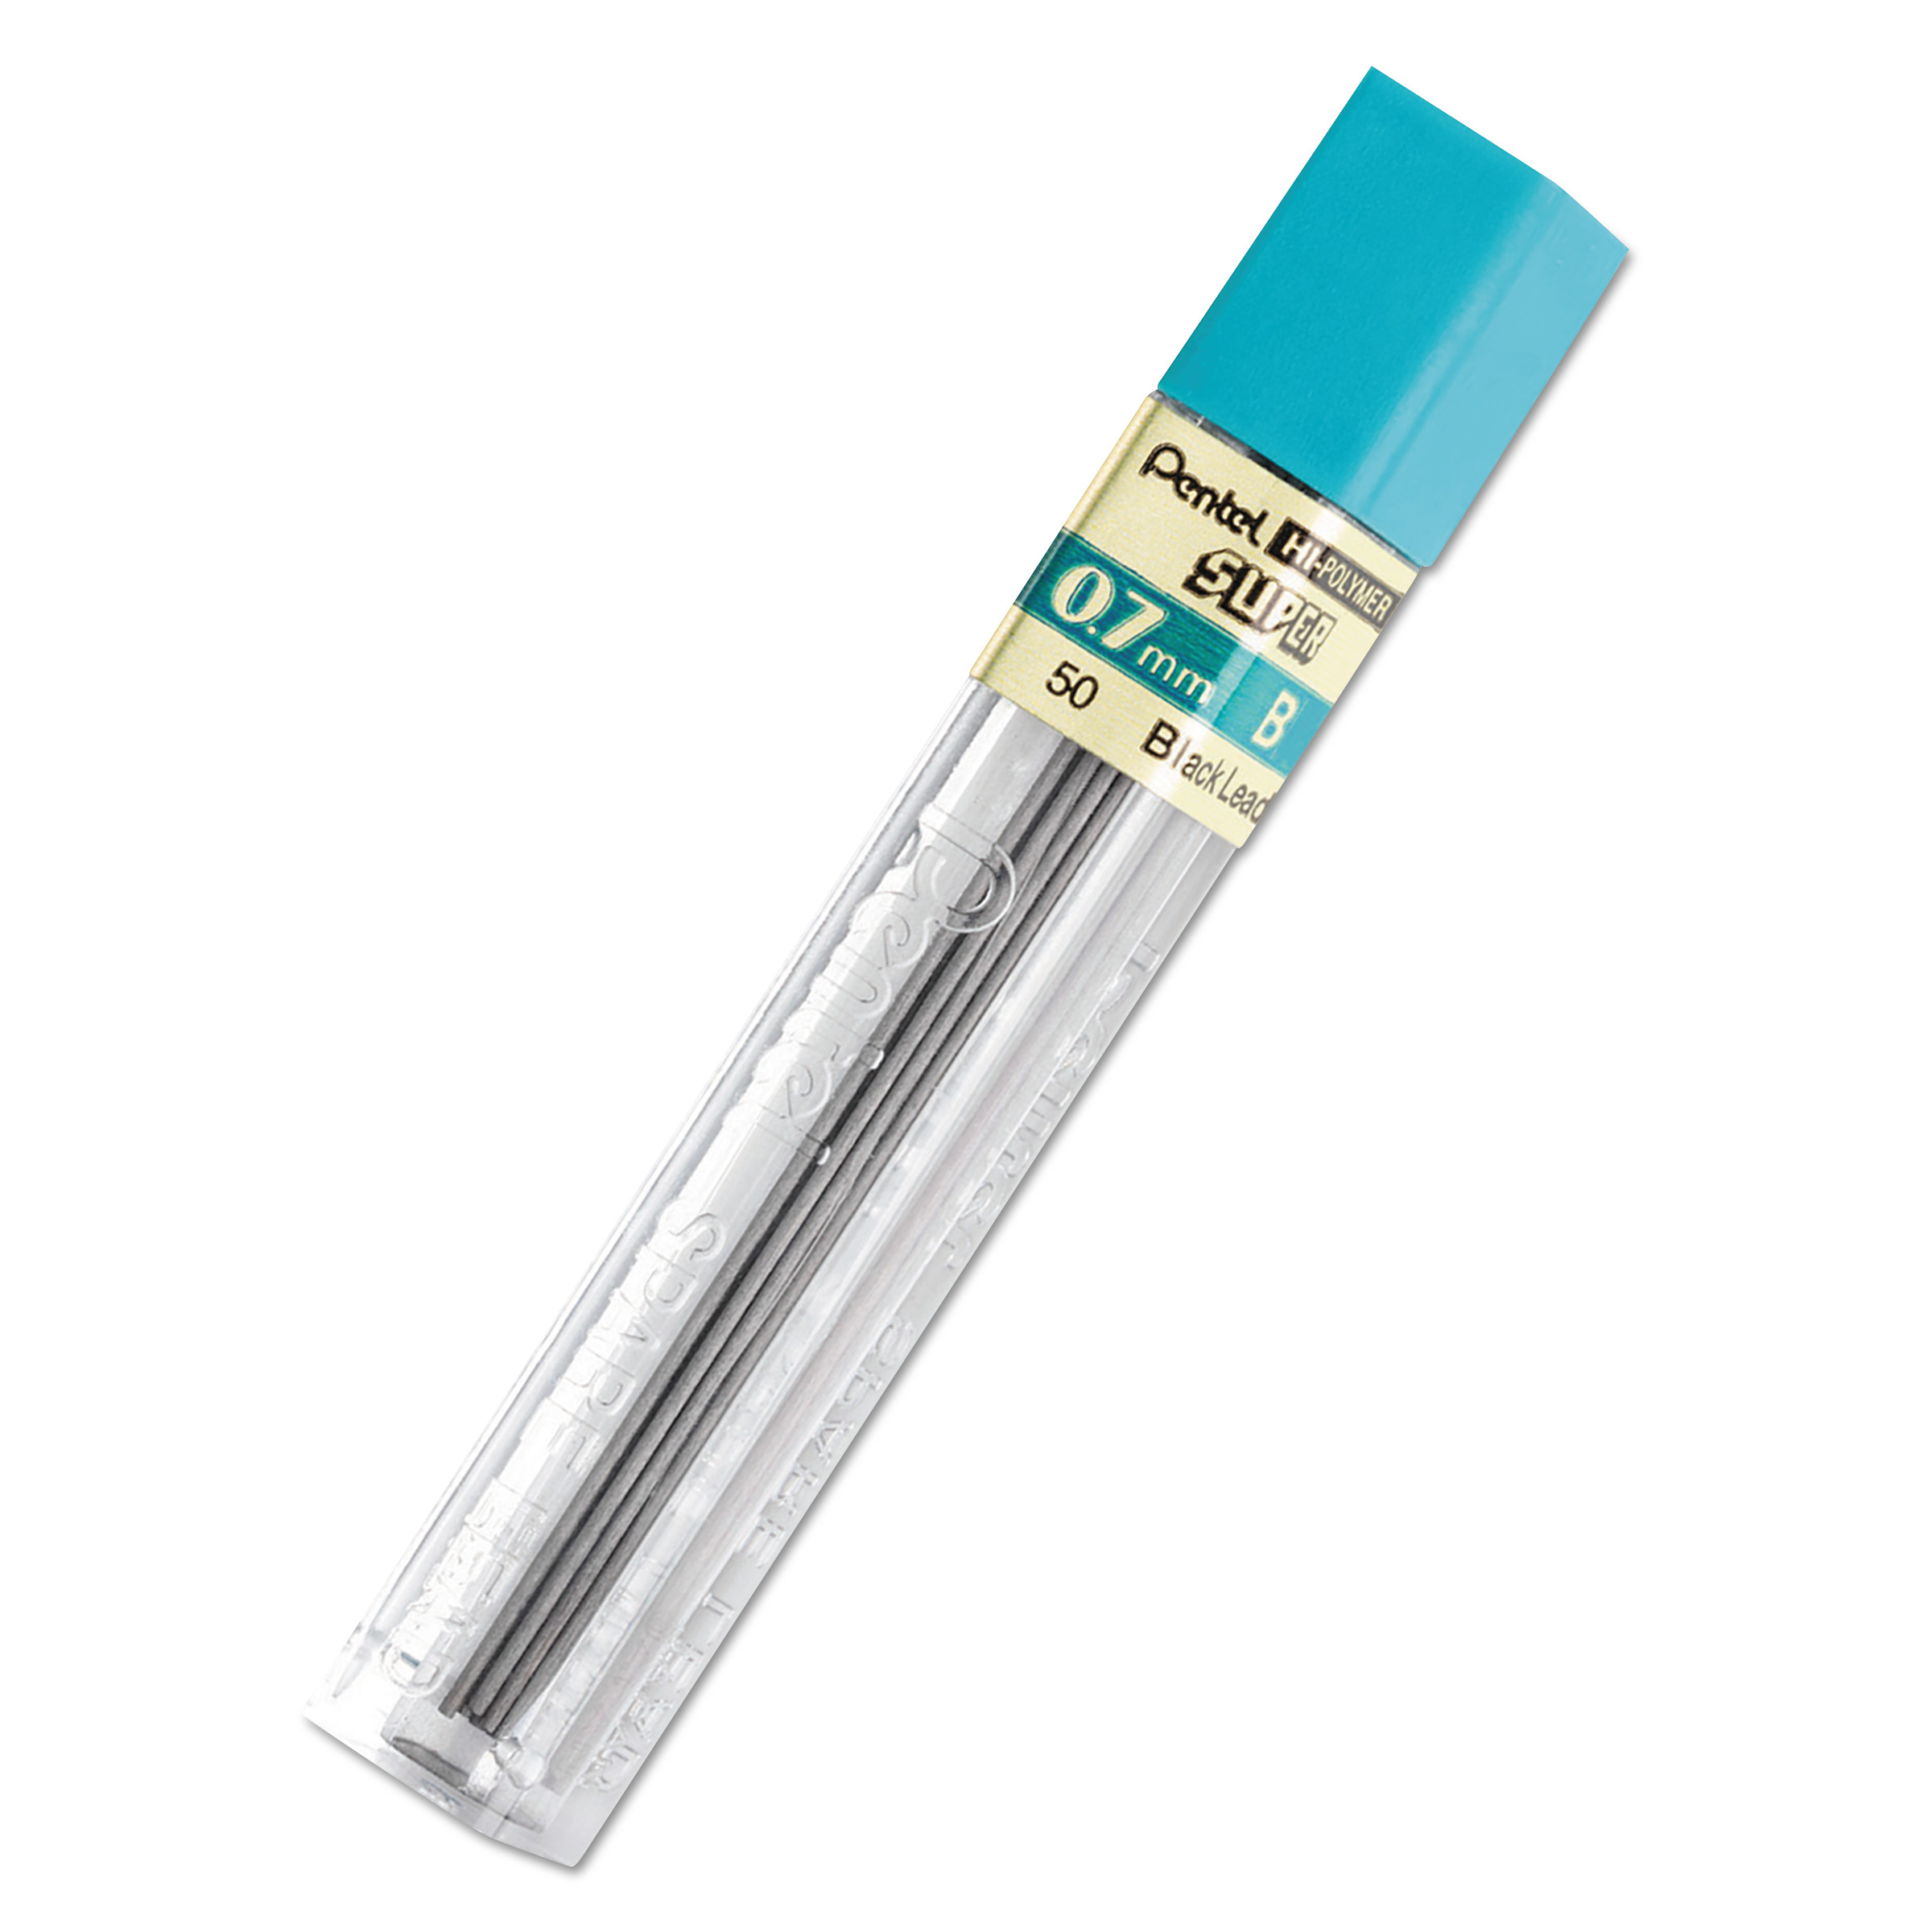 Super Hi-Polymer Lead Refills, 0.7 mm, B, Black, 12/Tube